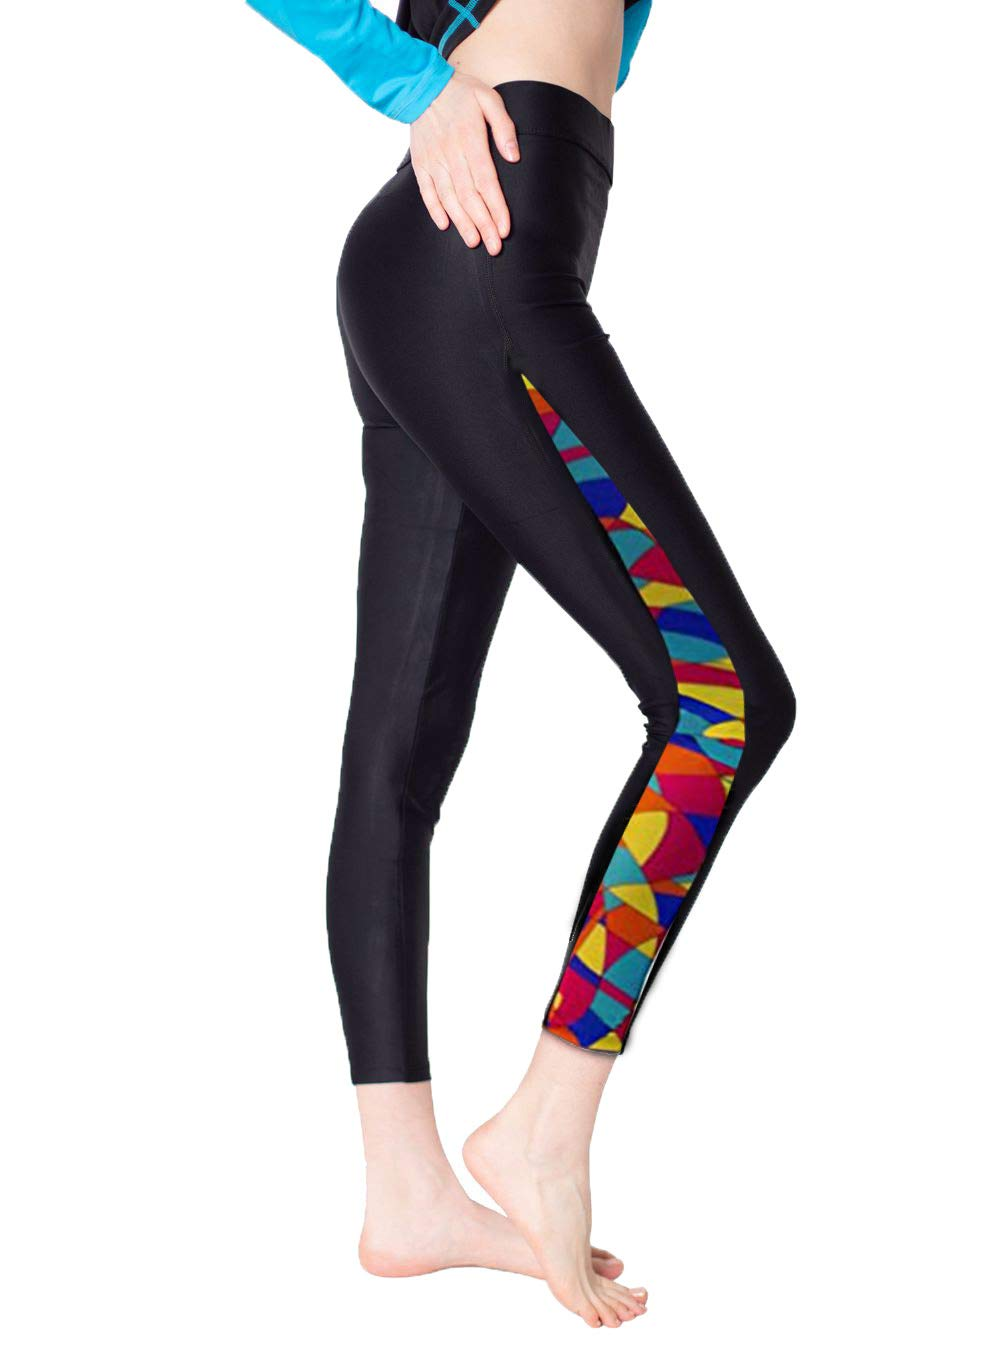 Surfing Leggings Women's Swim Tights Swimming Pants Floral-3 S by Scodi